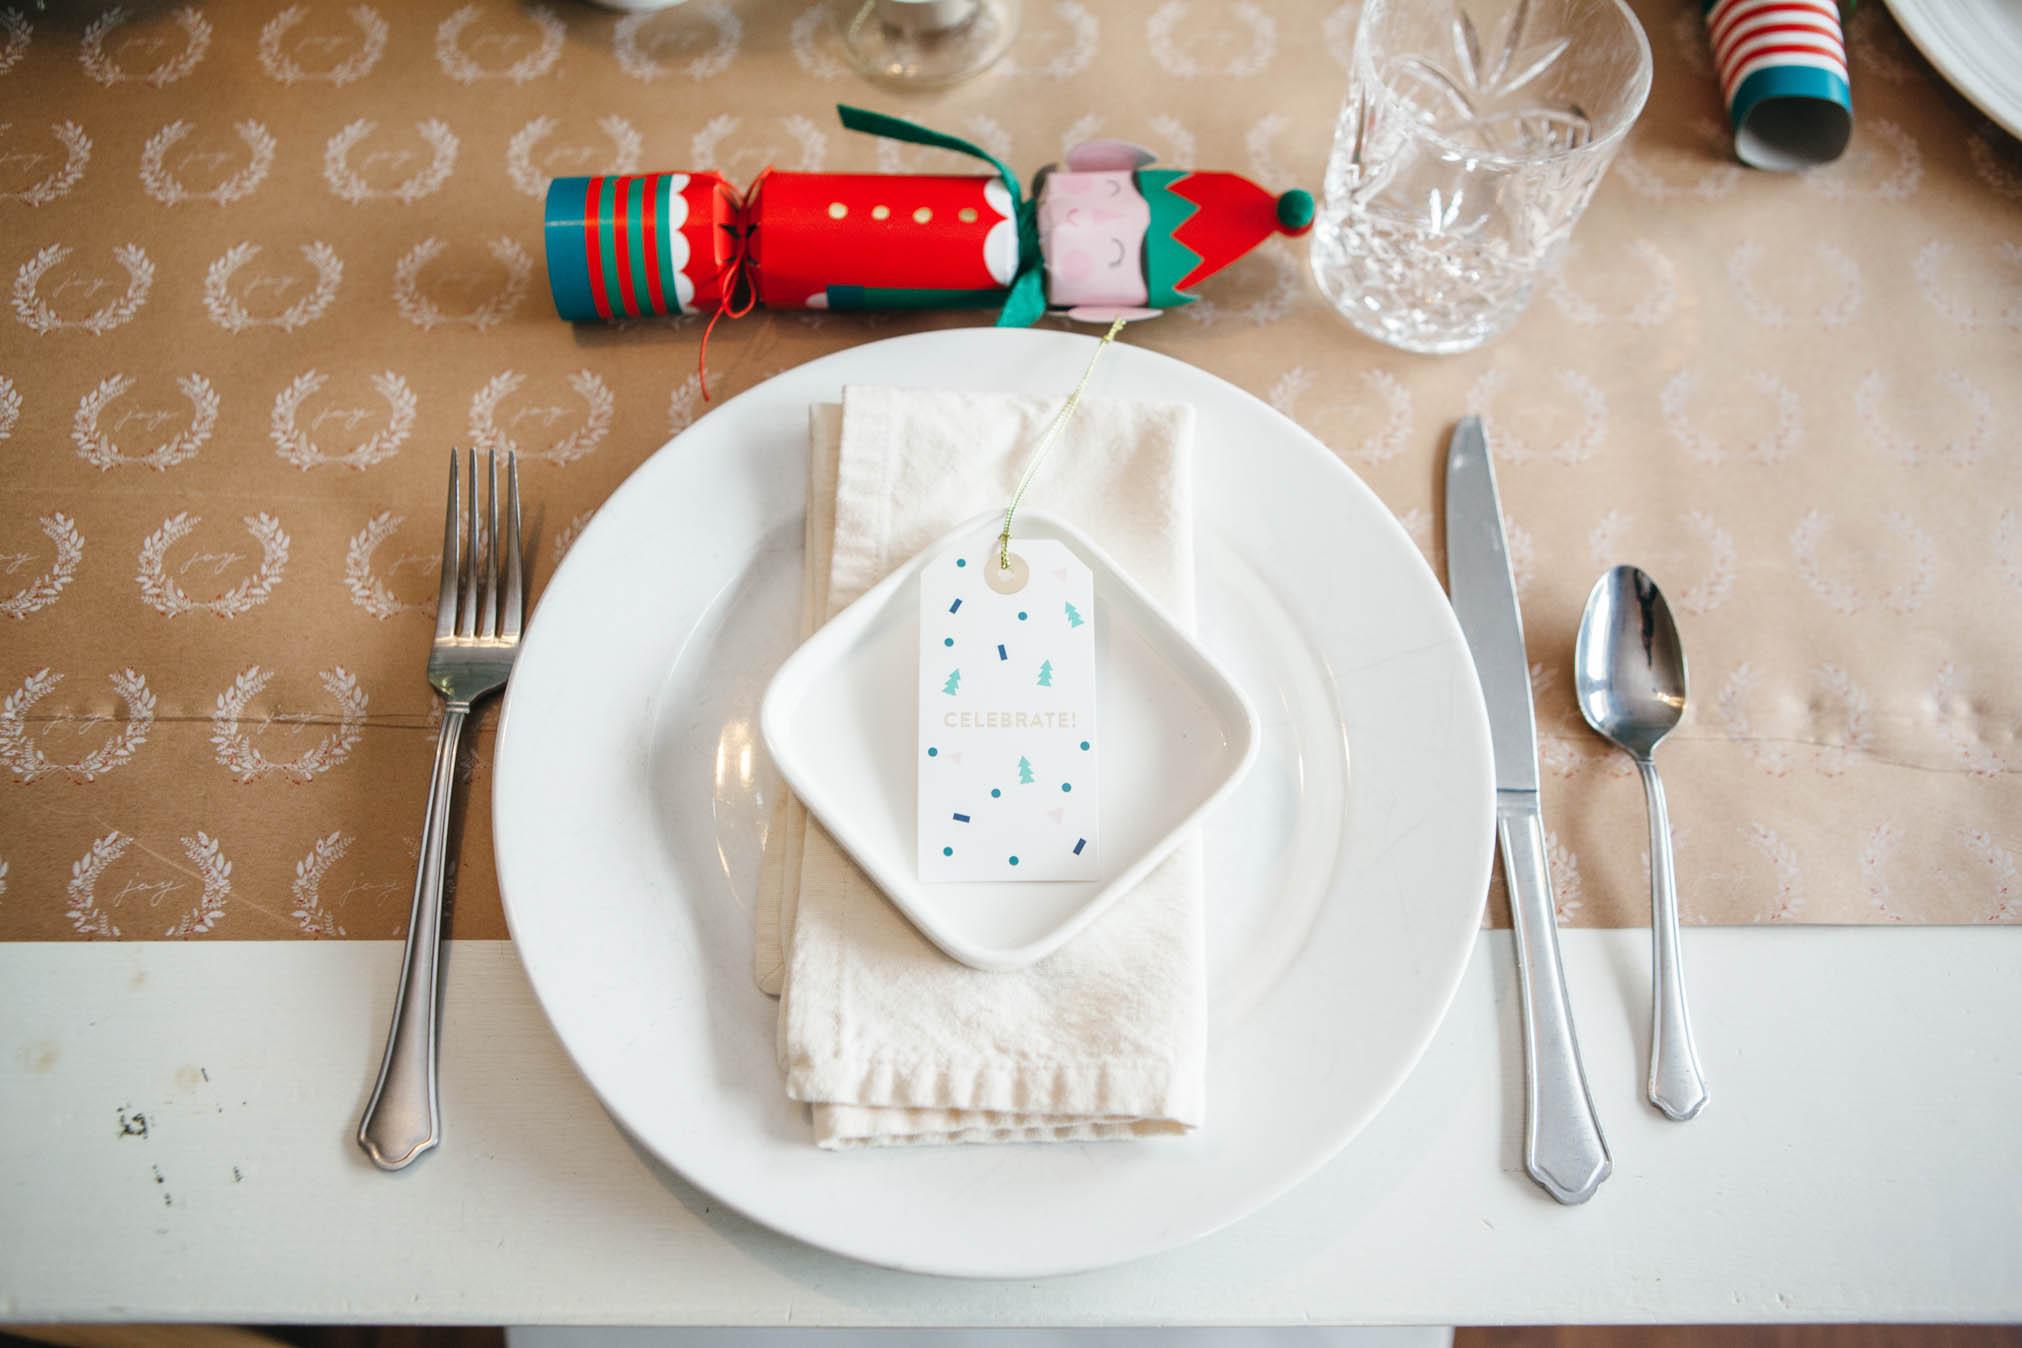 simple fun festive holiday table setting